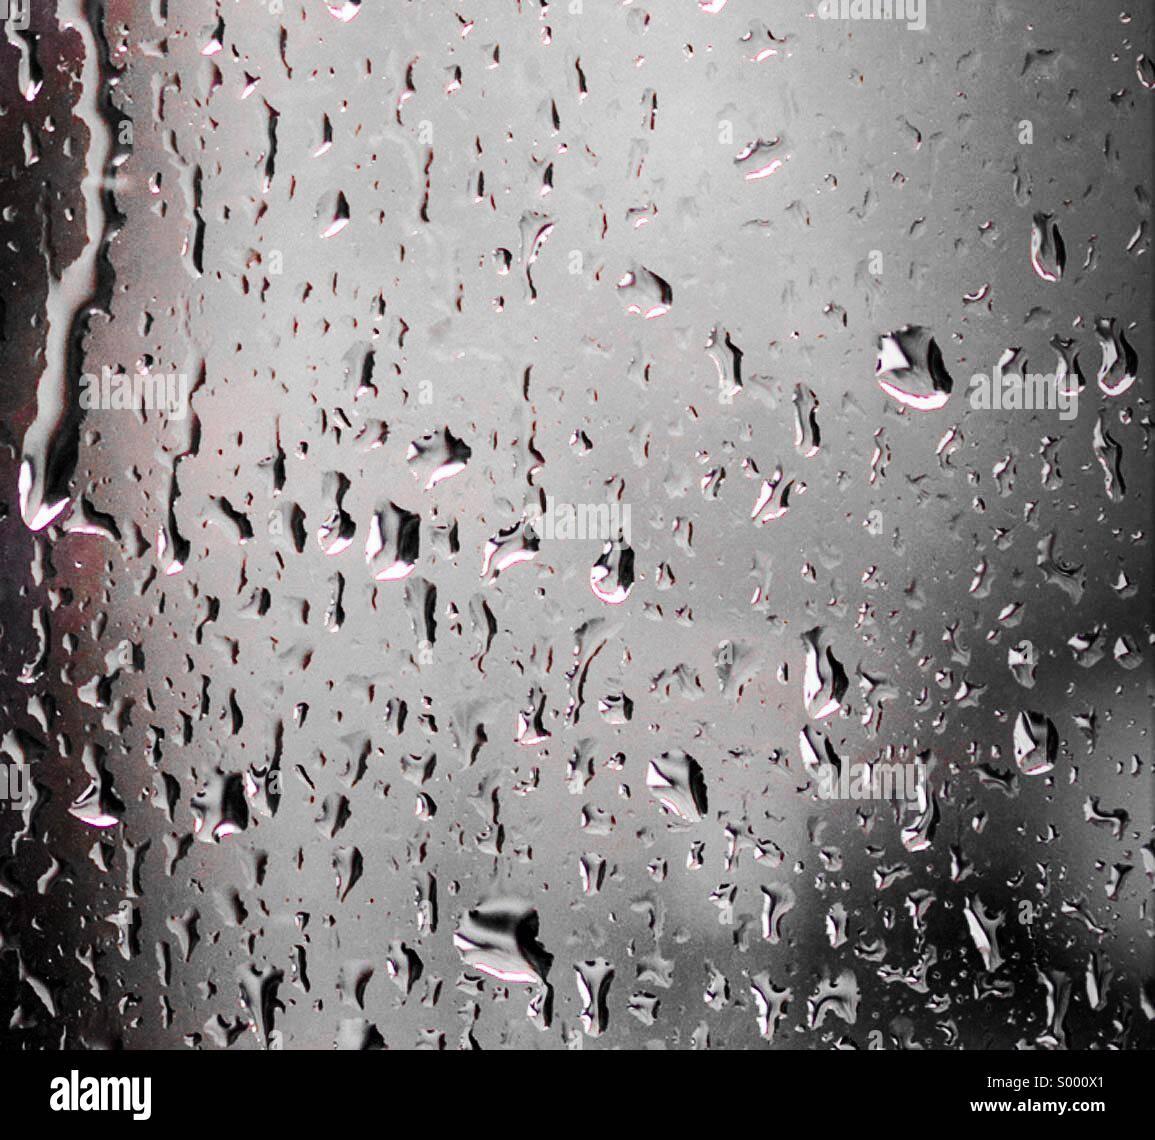 rain drops stockfotos rain drops bilder alamy. Black Bedroom Furniture Sets. Home Design Ideas